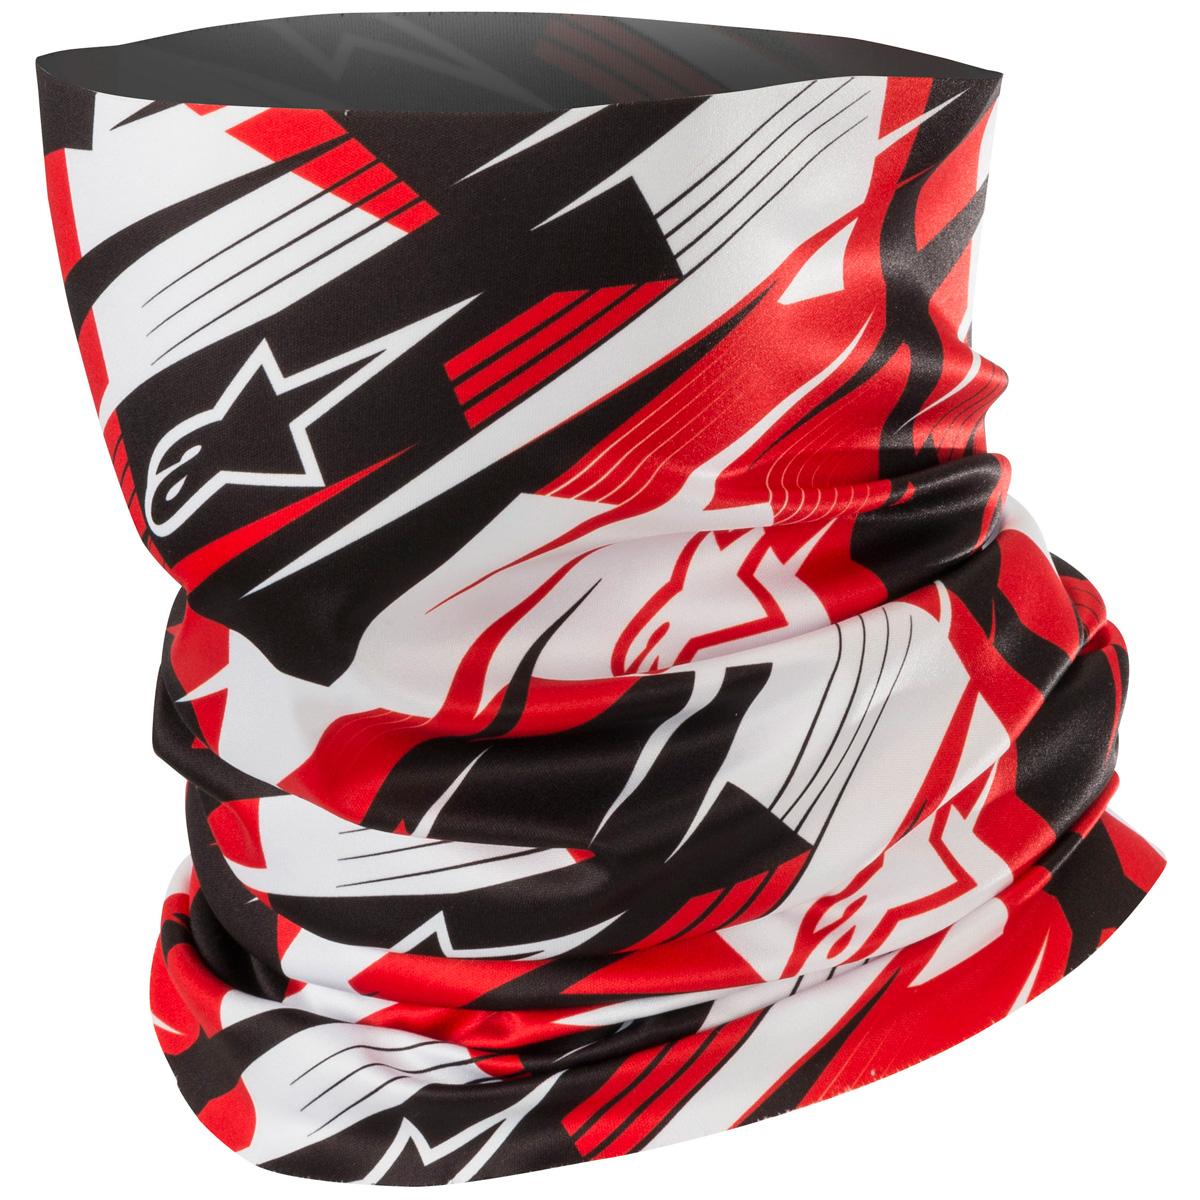 Térmico ALPINESTARS Blurred Black / White / Red